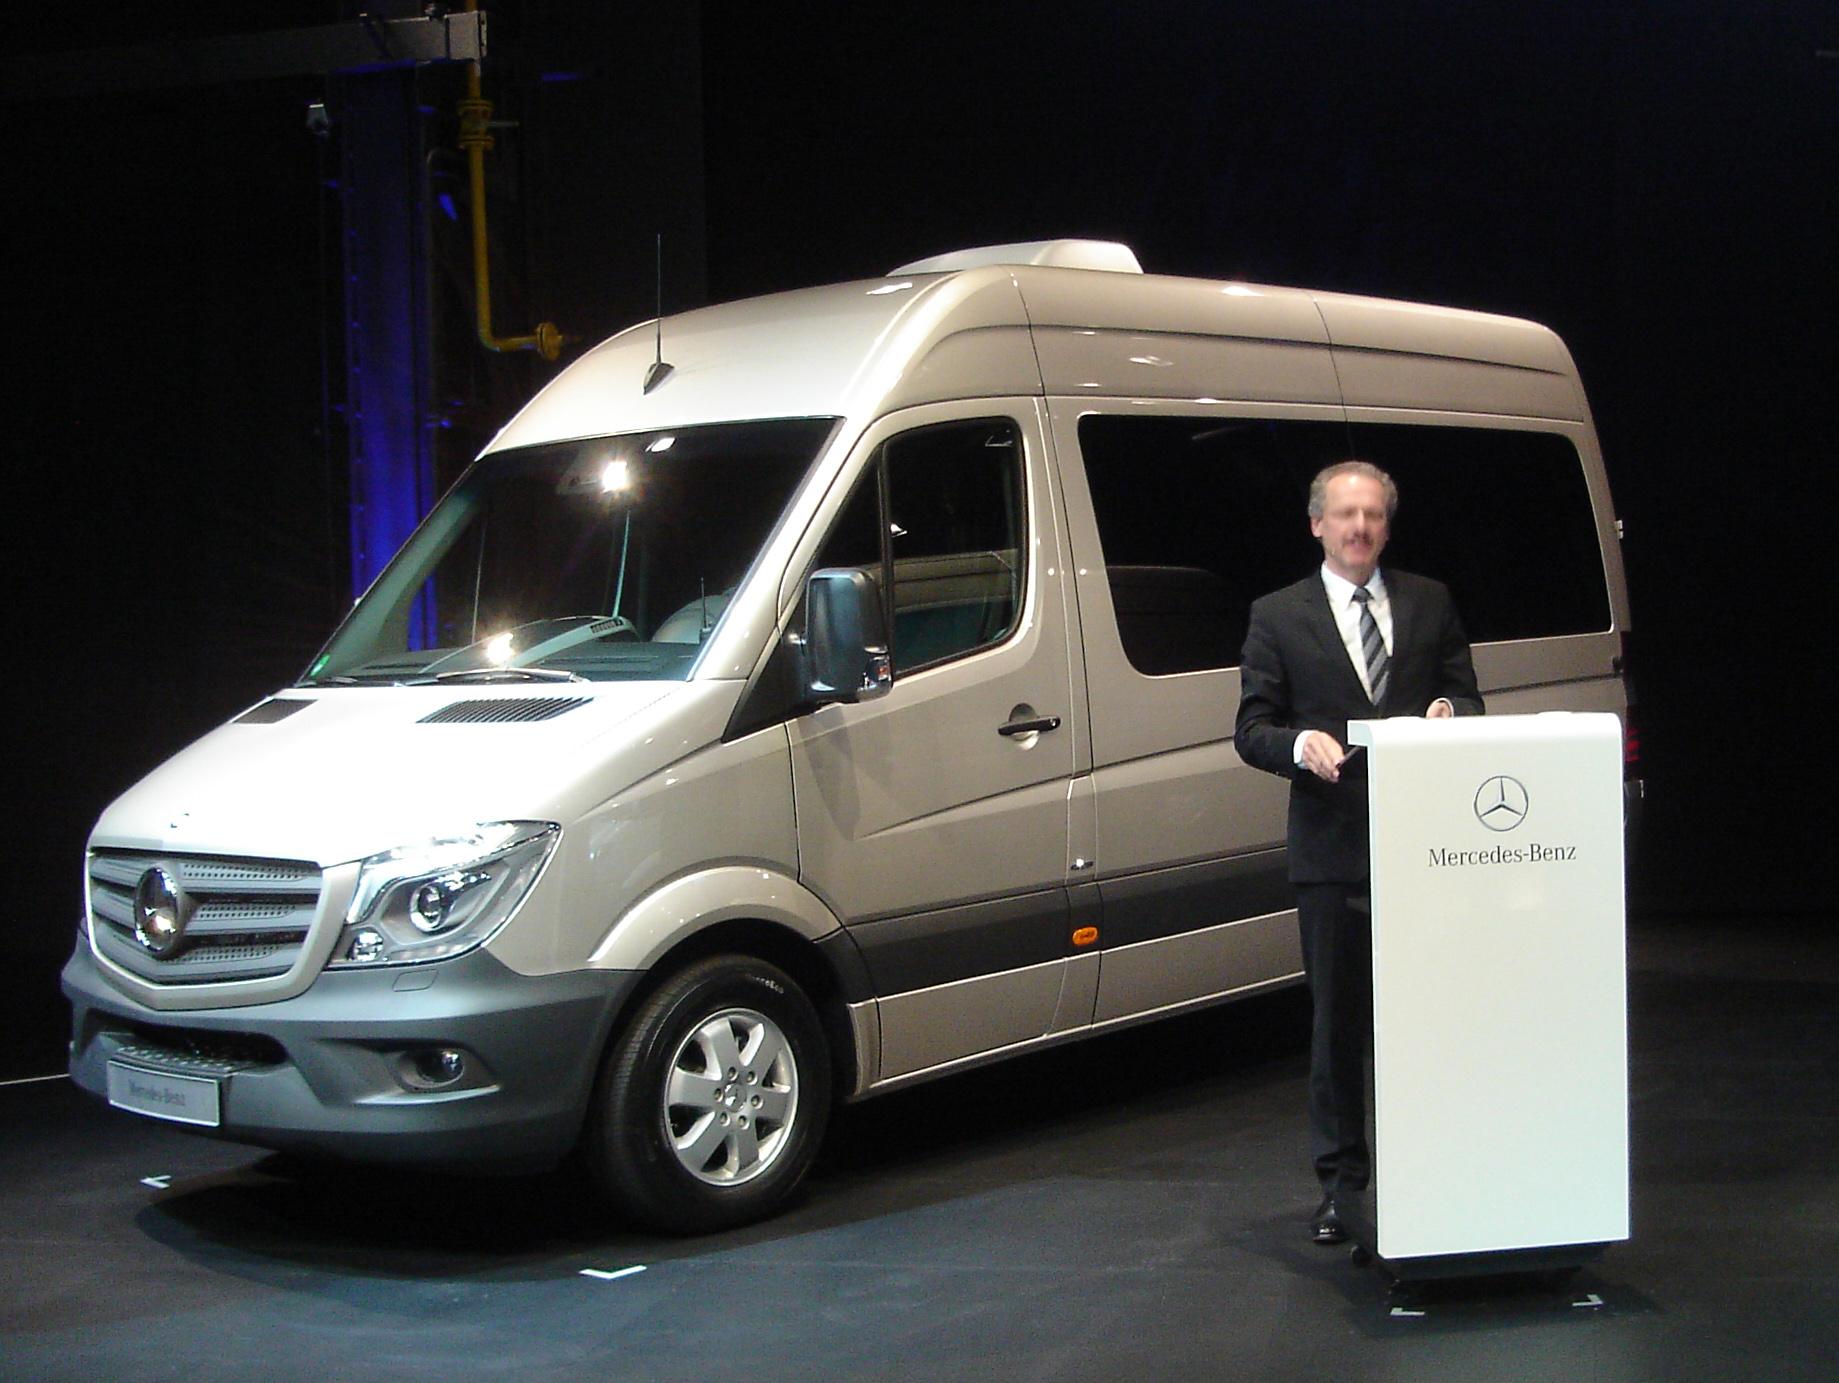 2014 Sprinter Van Gets Fresh Styling, Powertrain, Safety Features